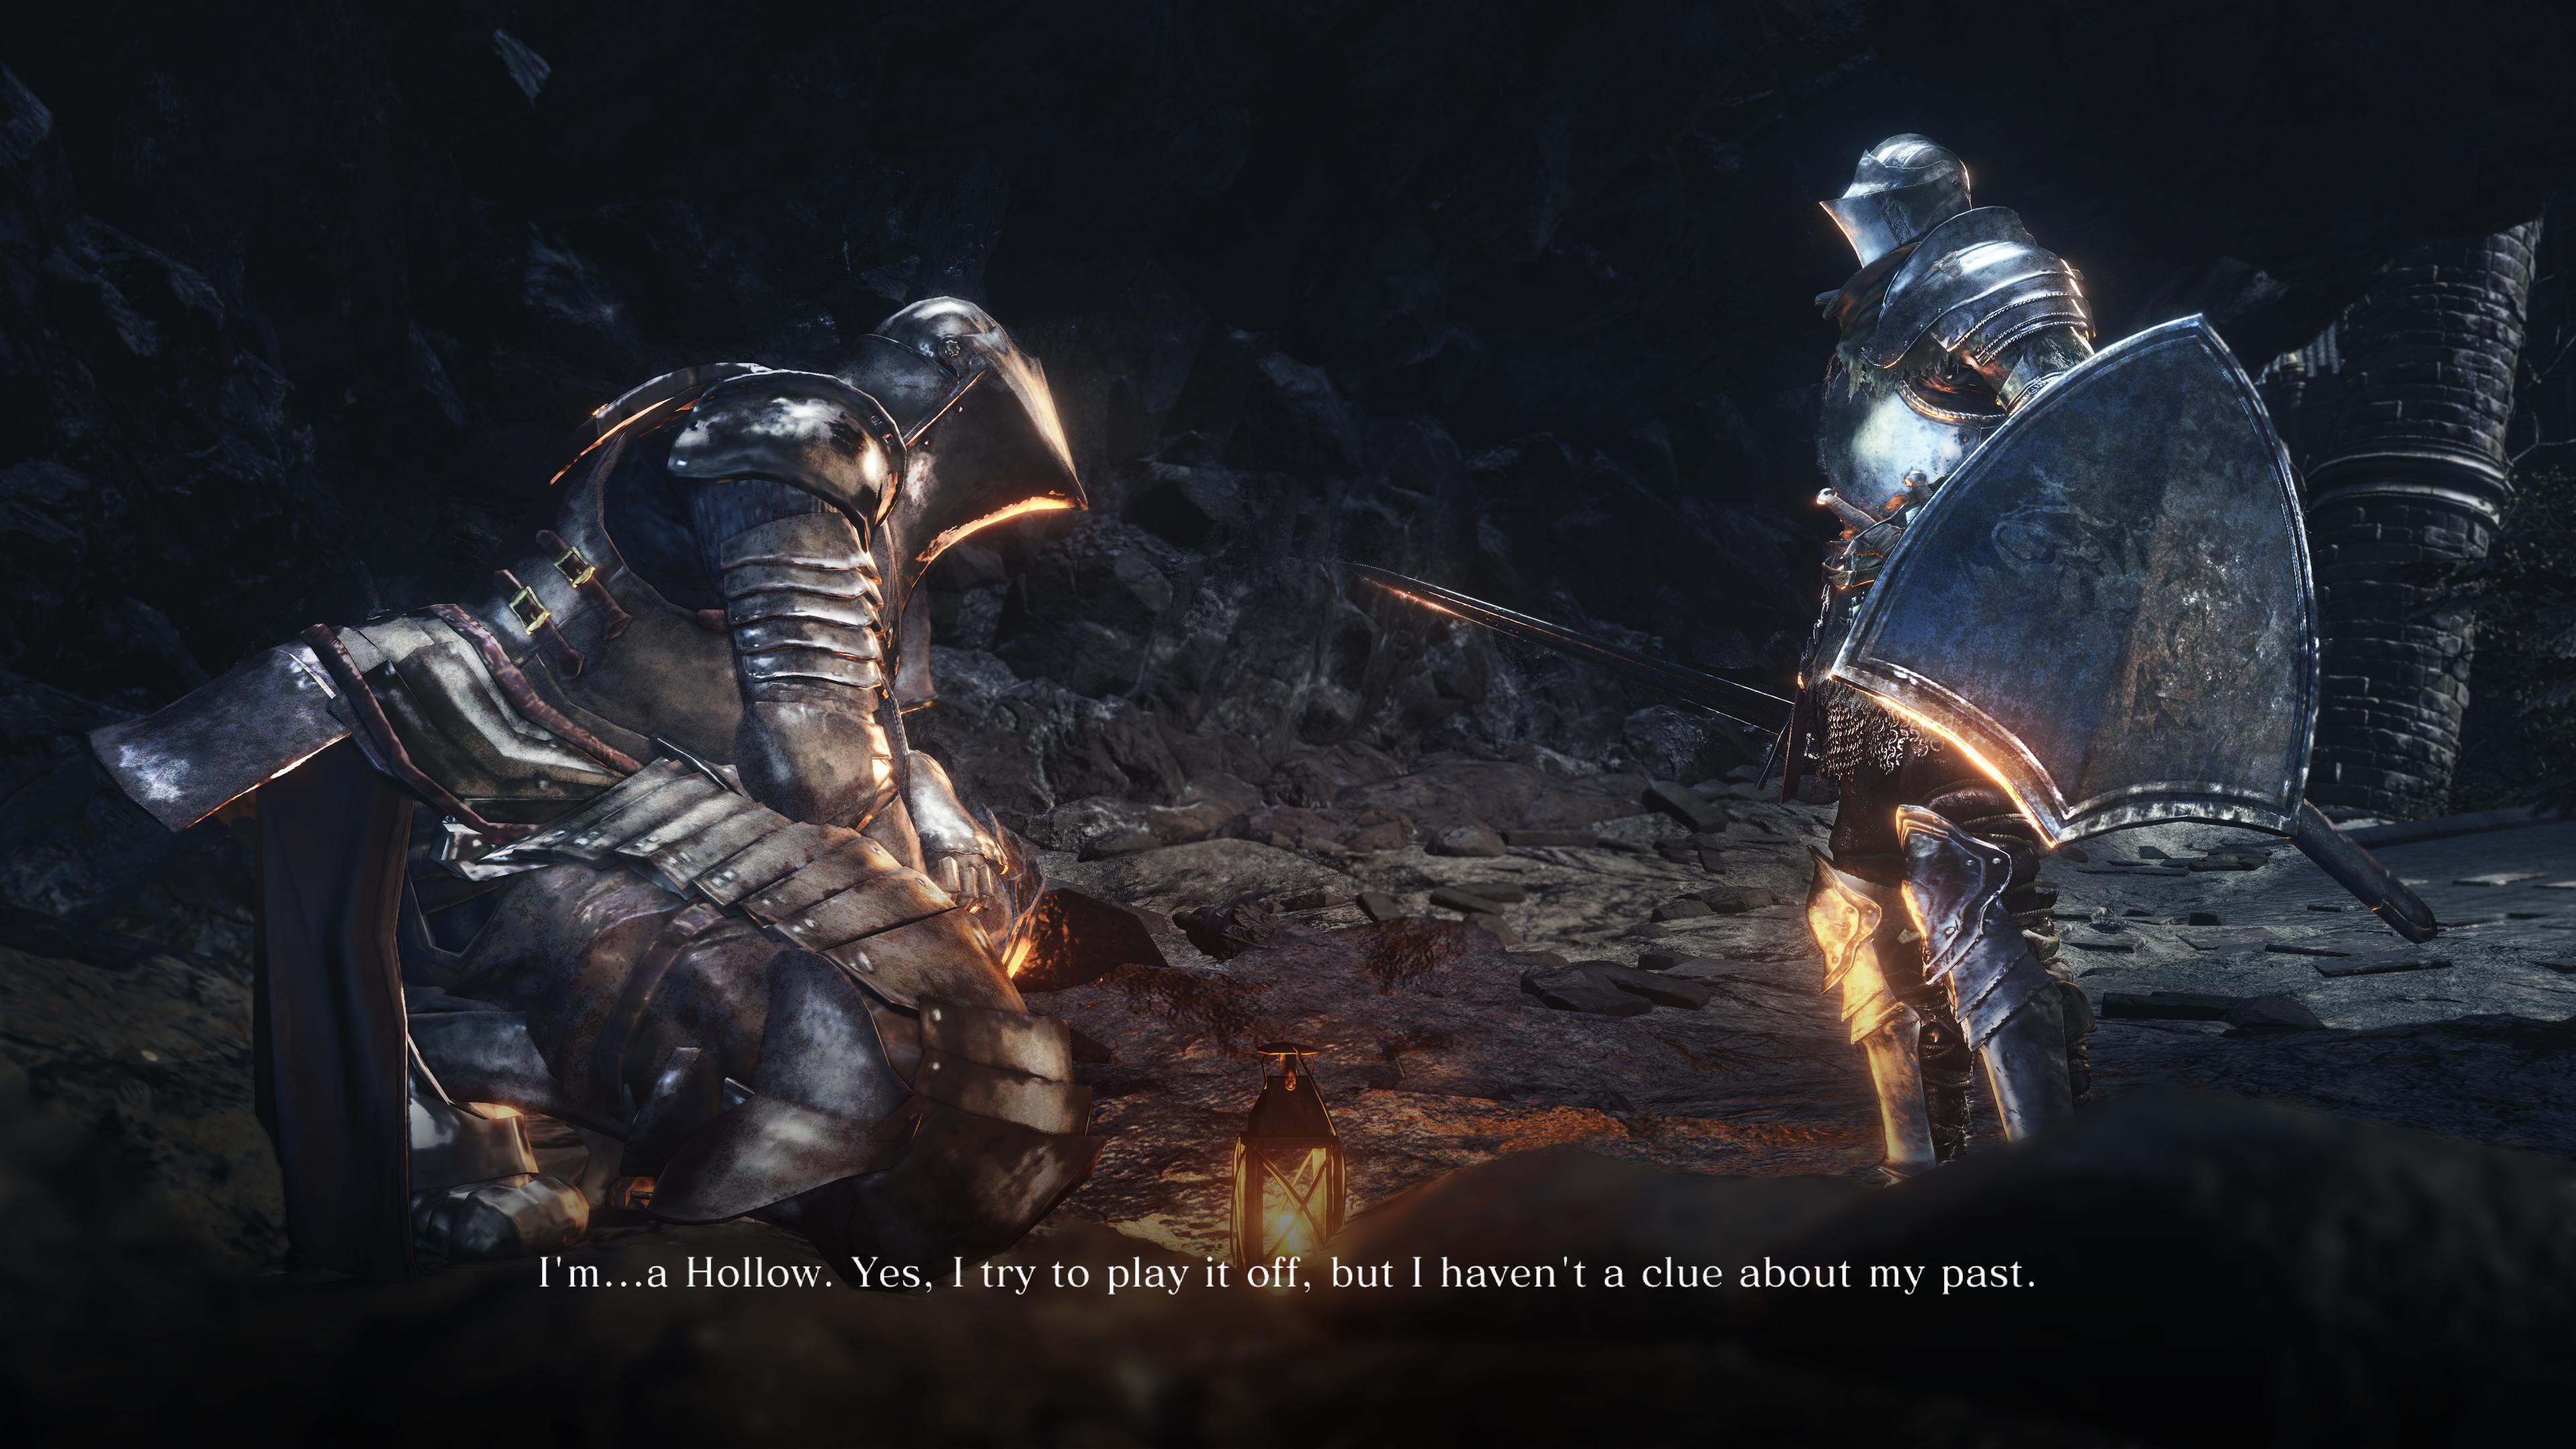 Dark Souls Iii The Ringed City Dlc Gets More Screenshots